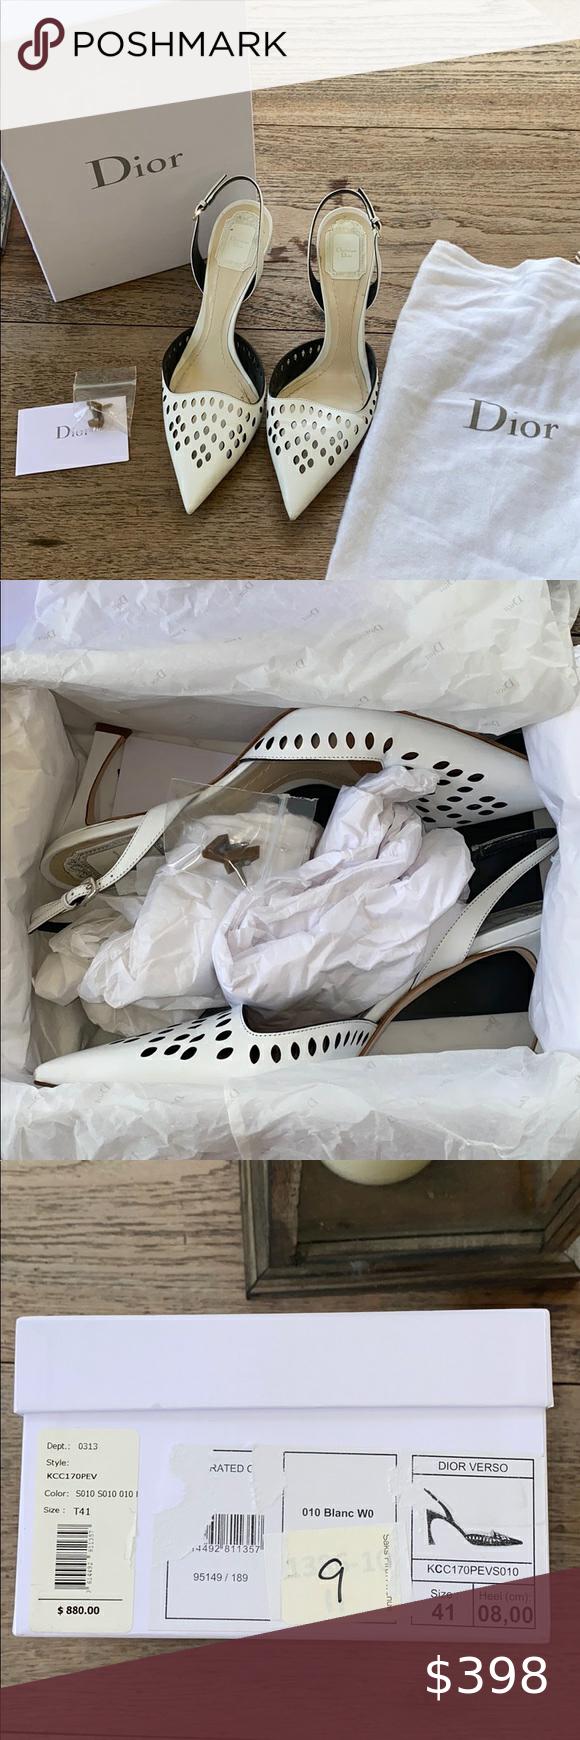 Dior Rare White Verso Slingback Sandals Slingback Sandal Slingback Shoes Women Heels